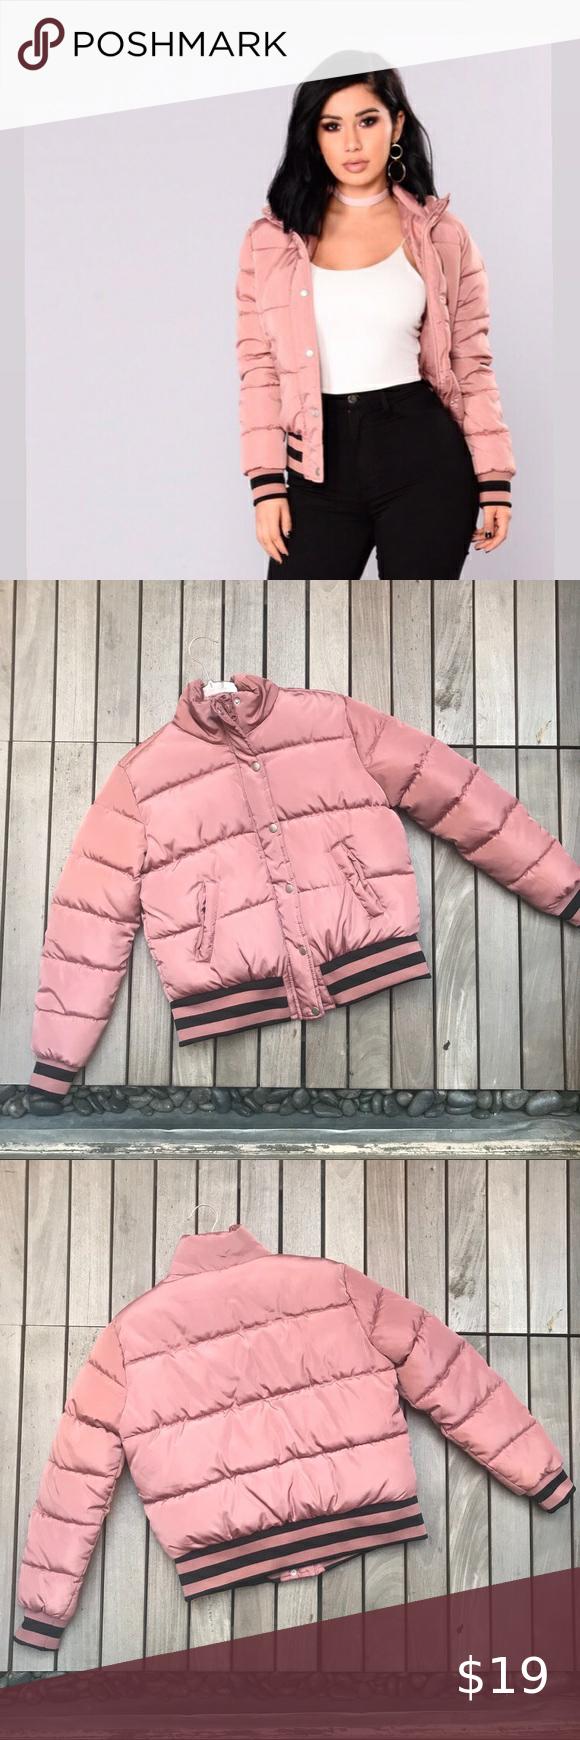 Fashion Nova Mrs Jackson Puffer Jacket Light Pink Fashion Fashion Nova Pink Fashion [ 1740 x 580 Pixel ]